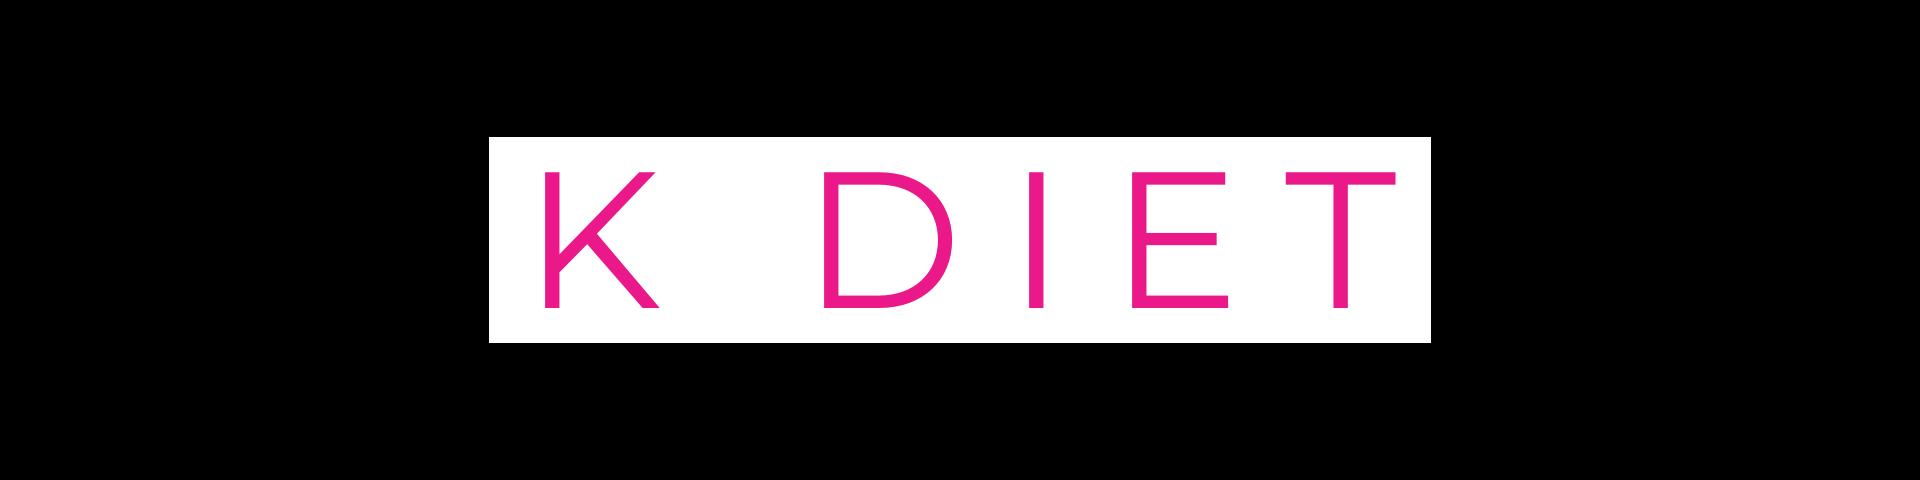 K DIET